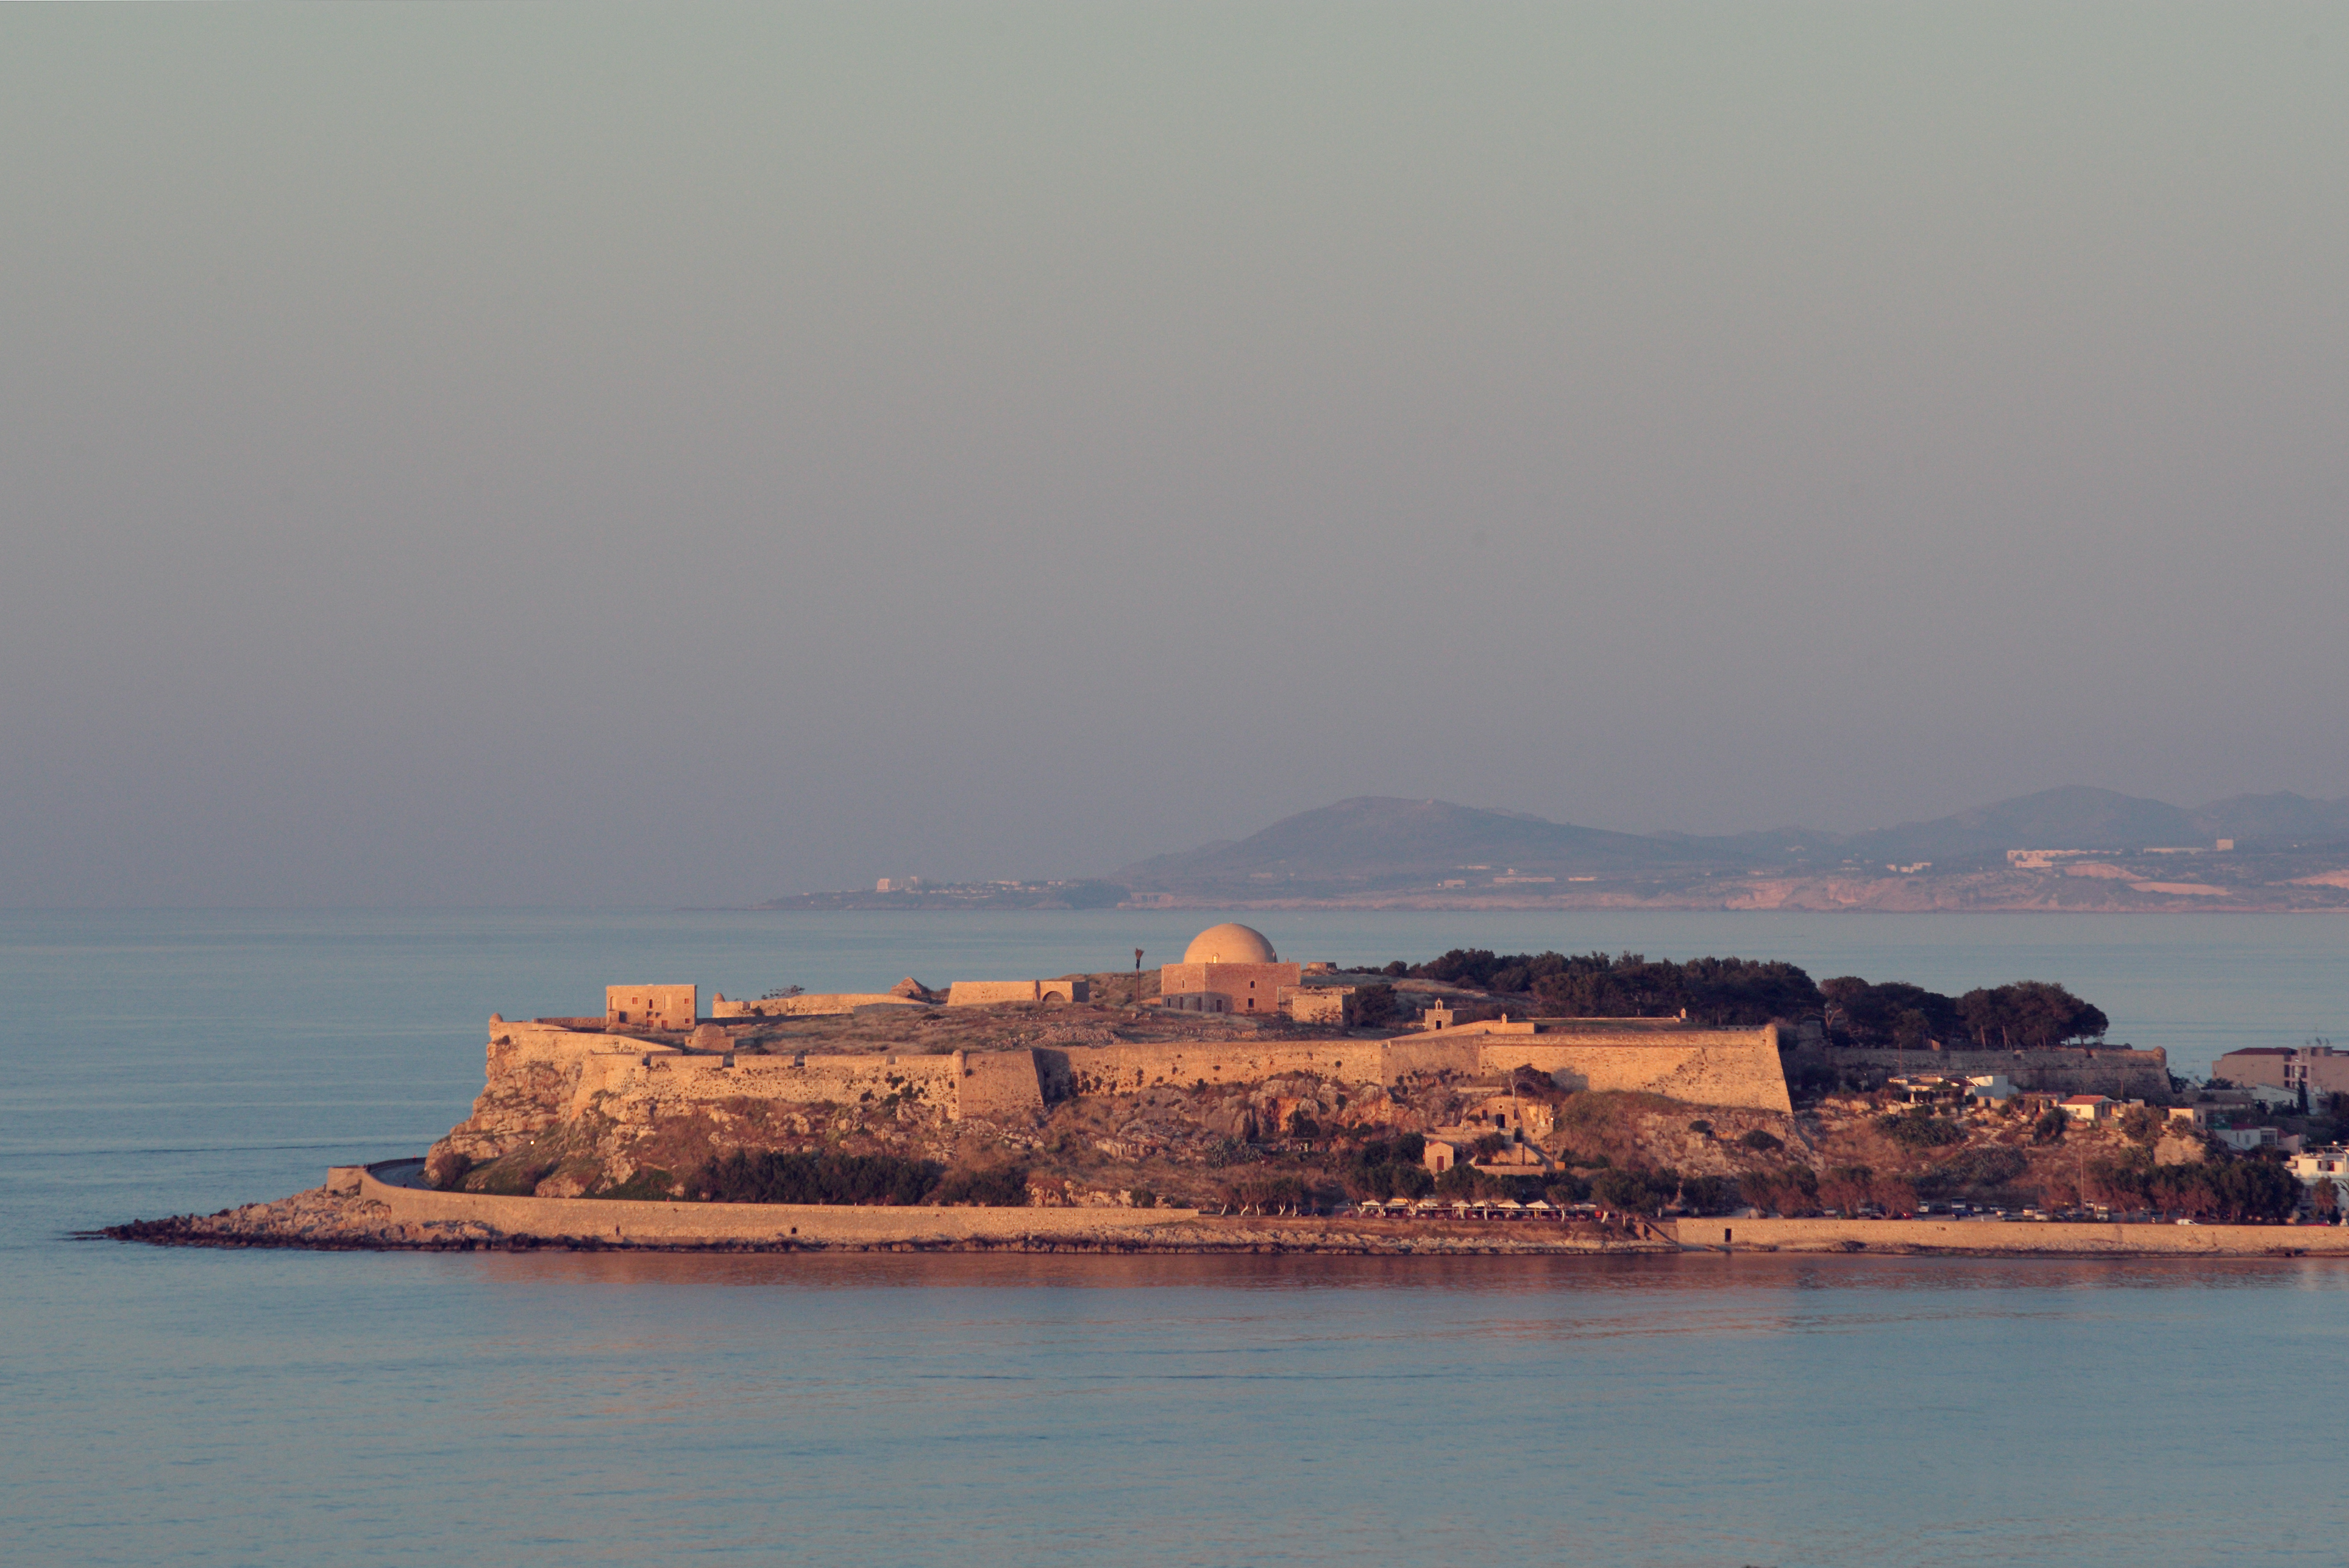 File:Rethymno-Fortezza(js).jpg